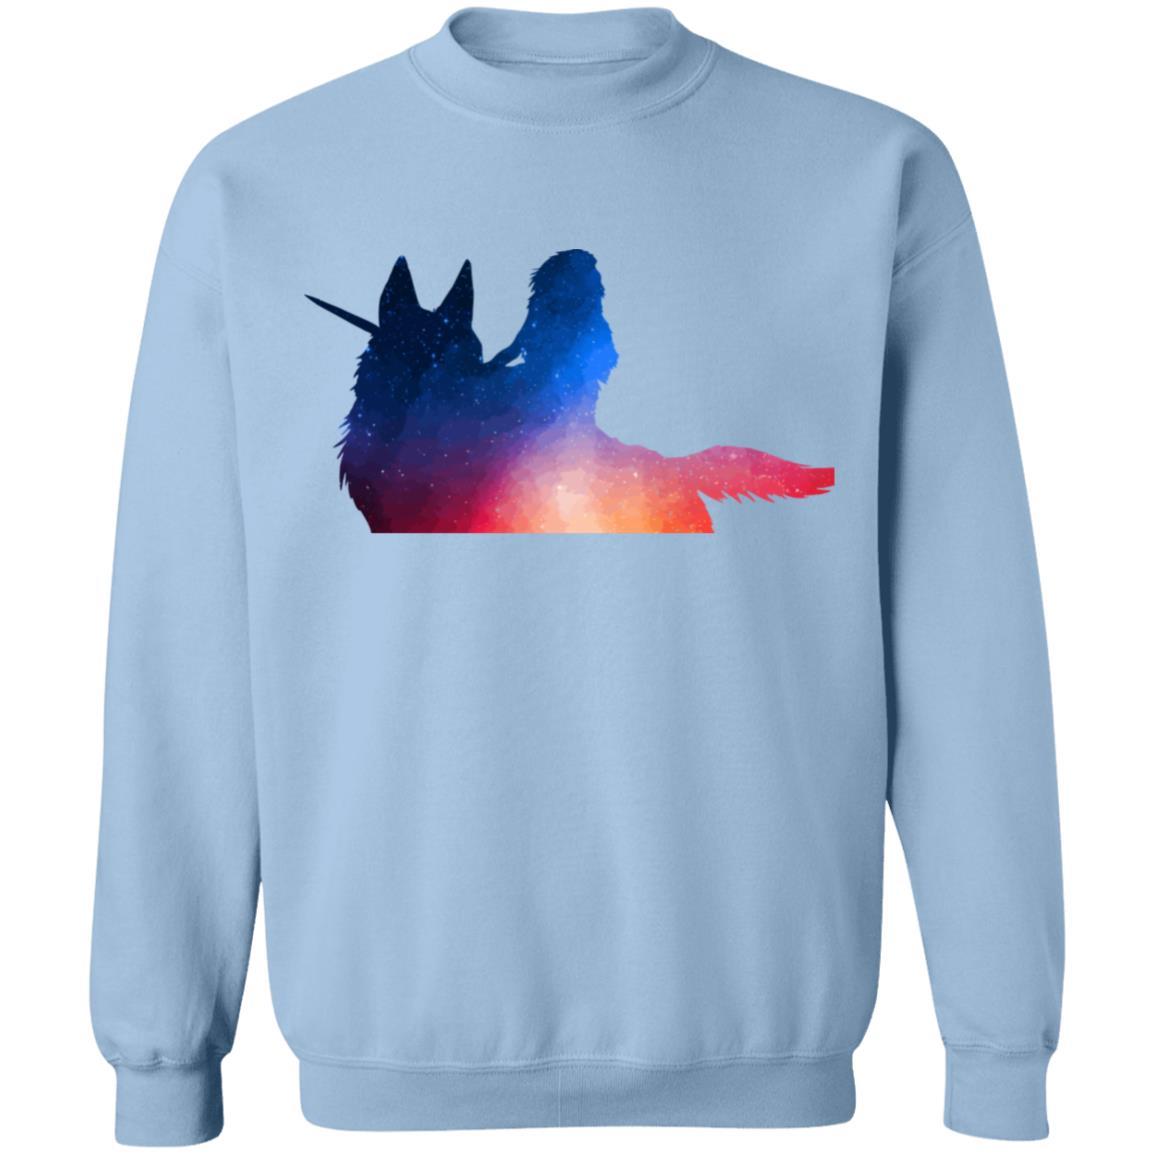 Princess Mononoke Rainbow Style Sweatshirt